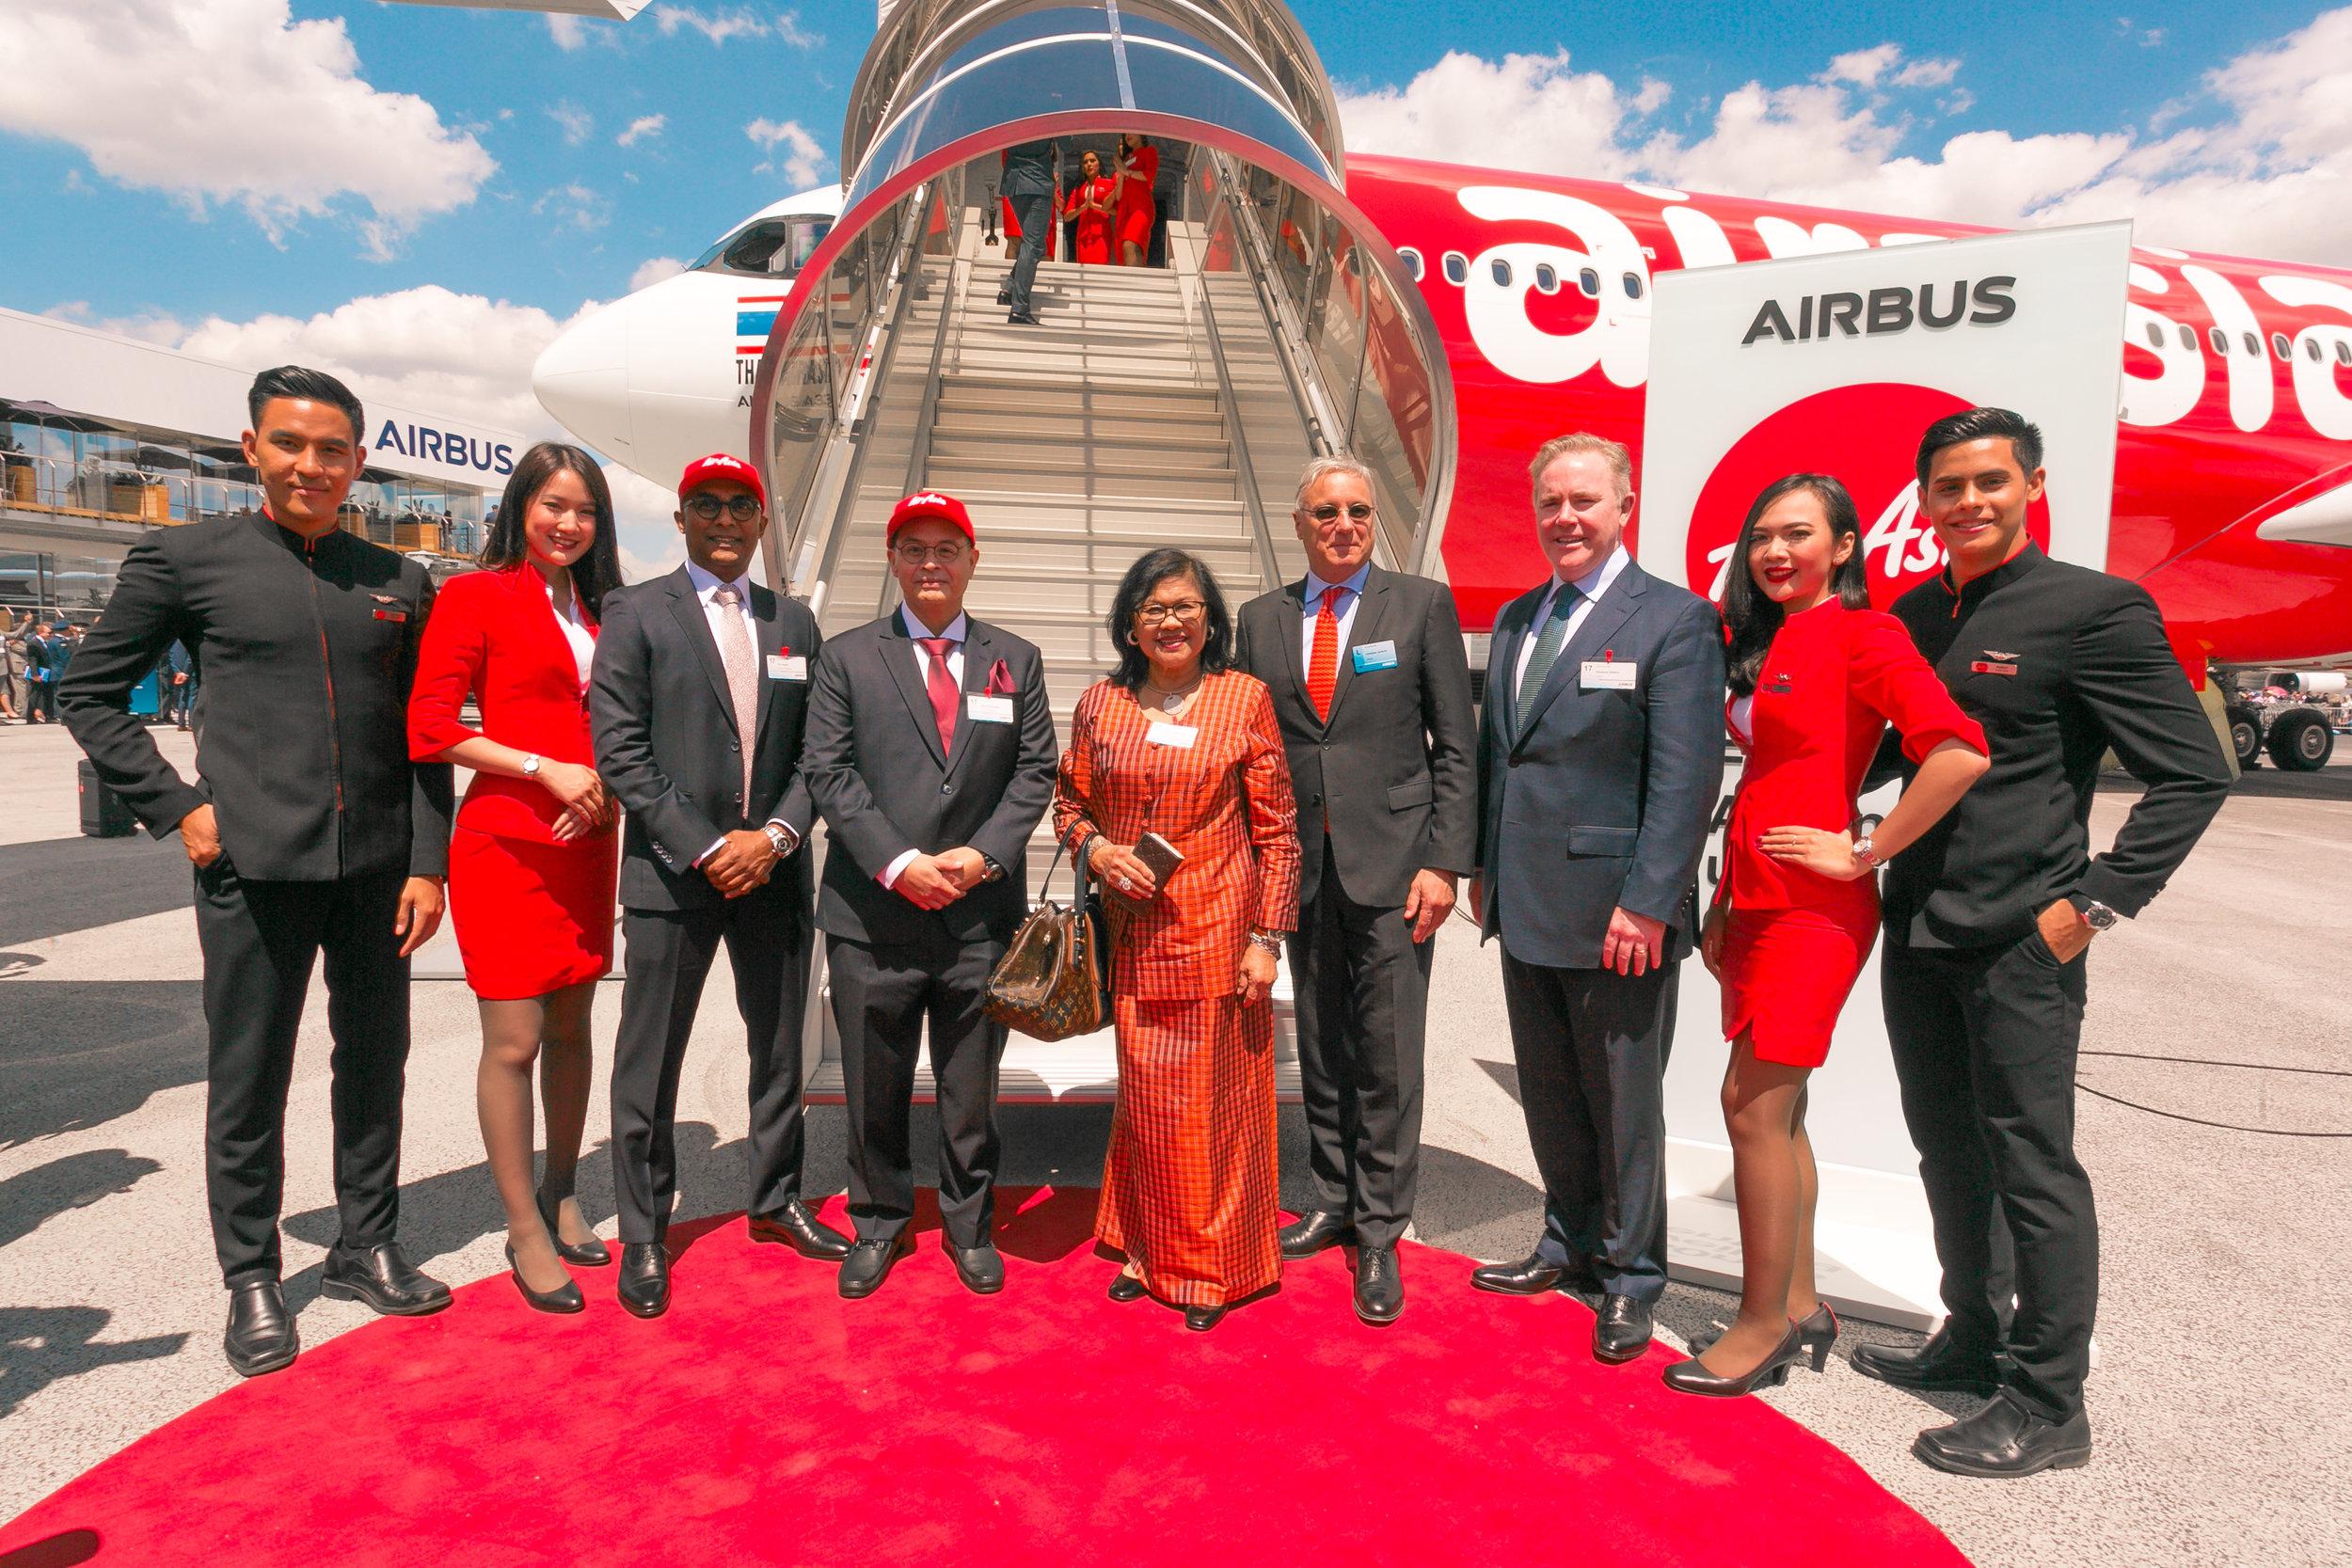 Photo Caption: (Third from Left) AirAsia Deputy Group CEO Airlines Bo Lingam, AirAsia X Group CEO Nadda Buranasiri, AirAsia X Berhad Chairman Tan Sri Rafidah Aziz, Airbus Chief Commercial Officer Christian Scherer and Avolon CEO Domhnal Slattery flanked by AirAsia Cabin Crew.